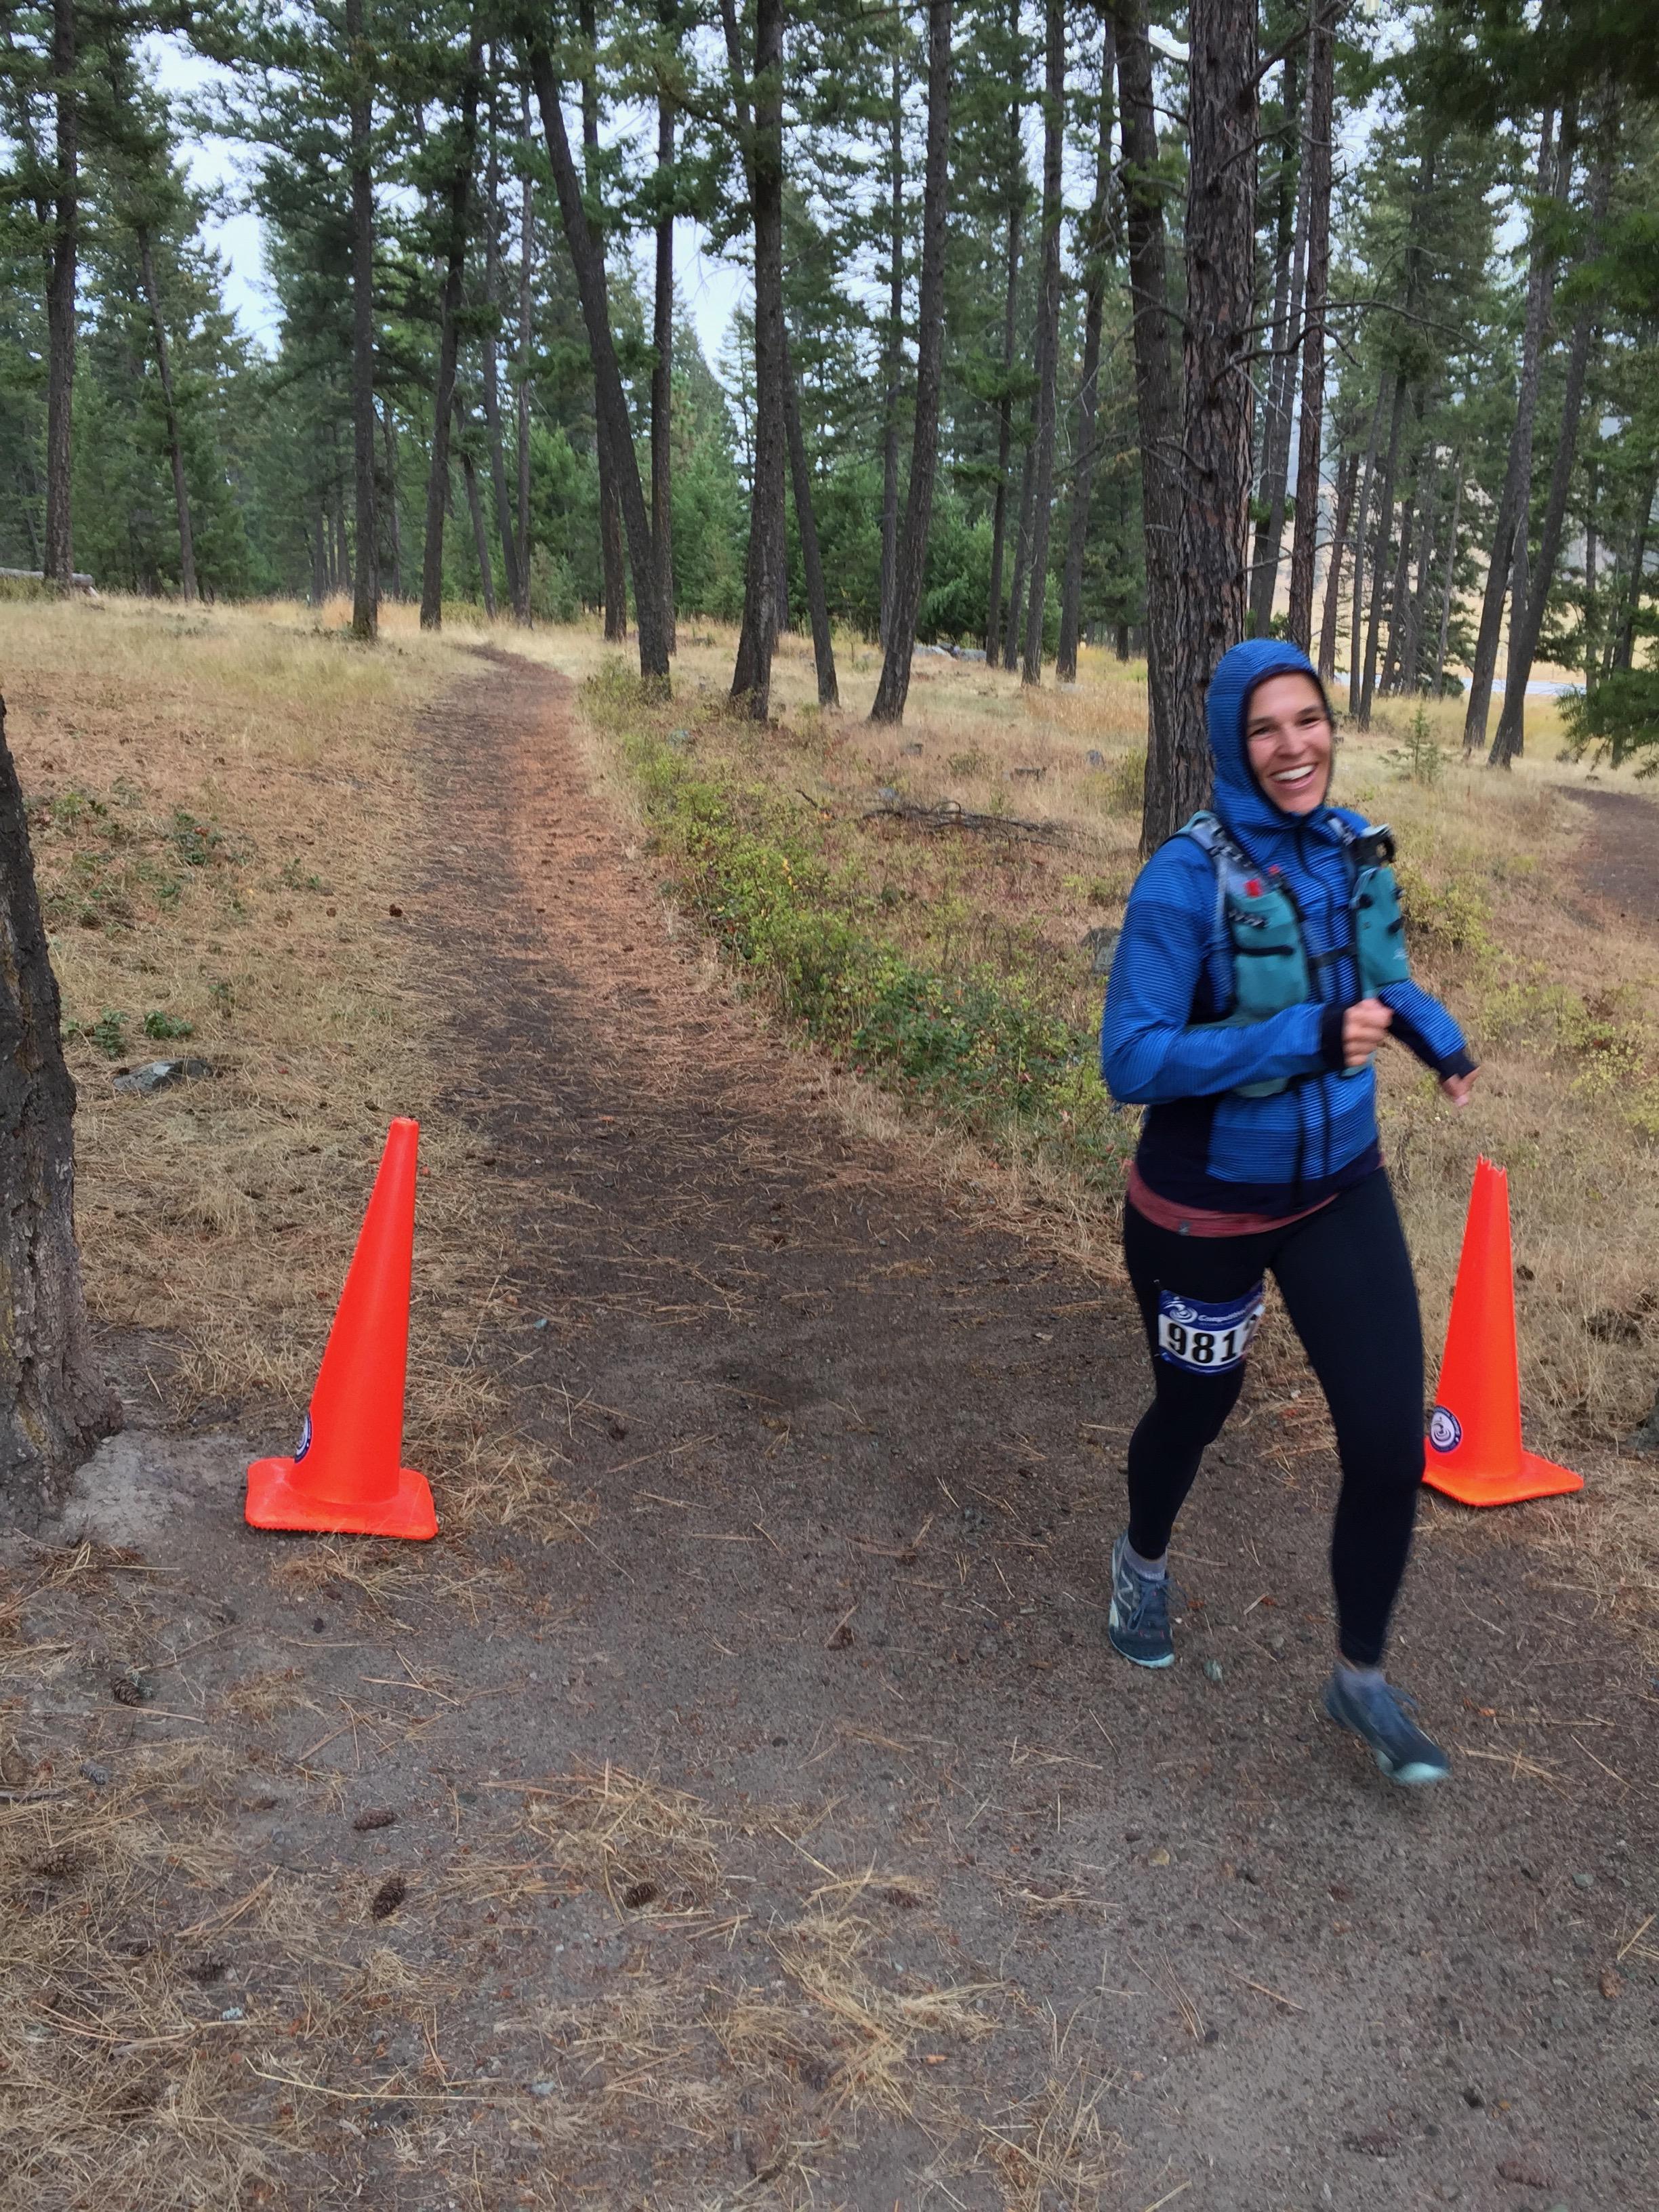 foys to blacktail trails trail marathon ftbtIMG_1095.JPG